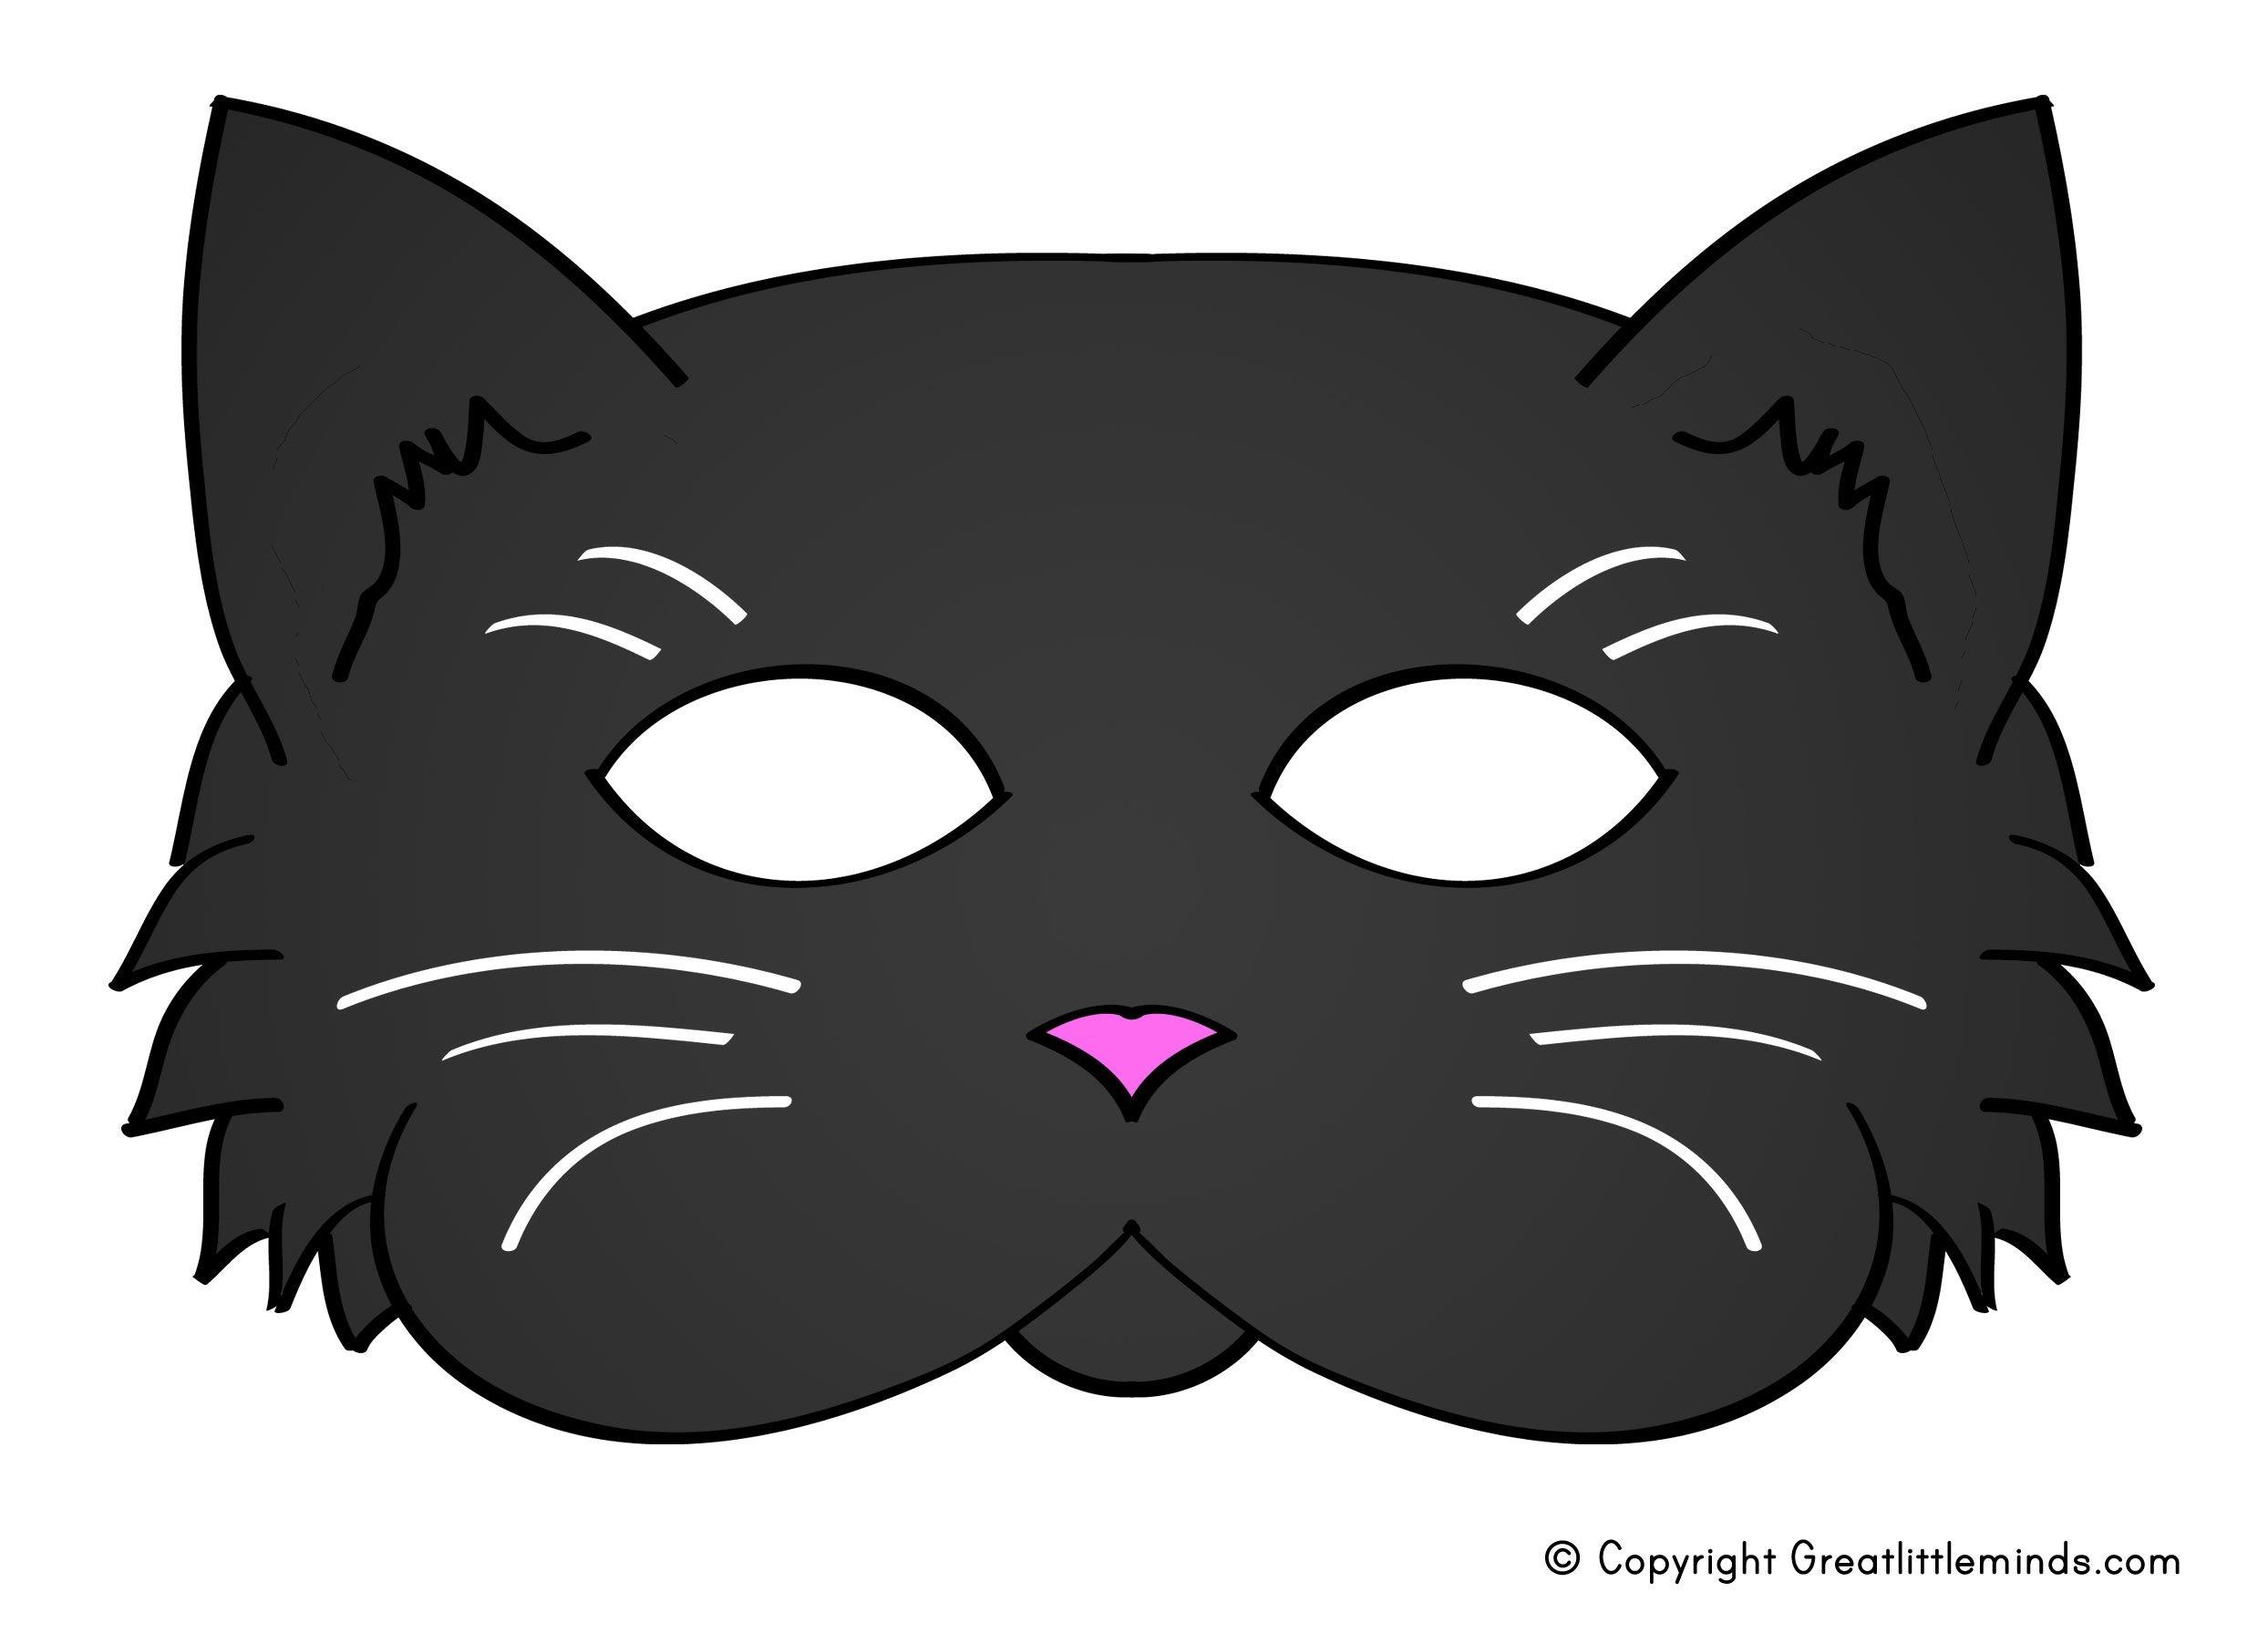 Pinjanell Jakub Brichacek On Ugly Duckling | Cat Mask, Cat Face - Animal Face Masks Printable Free